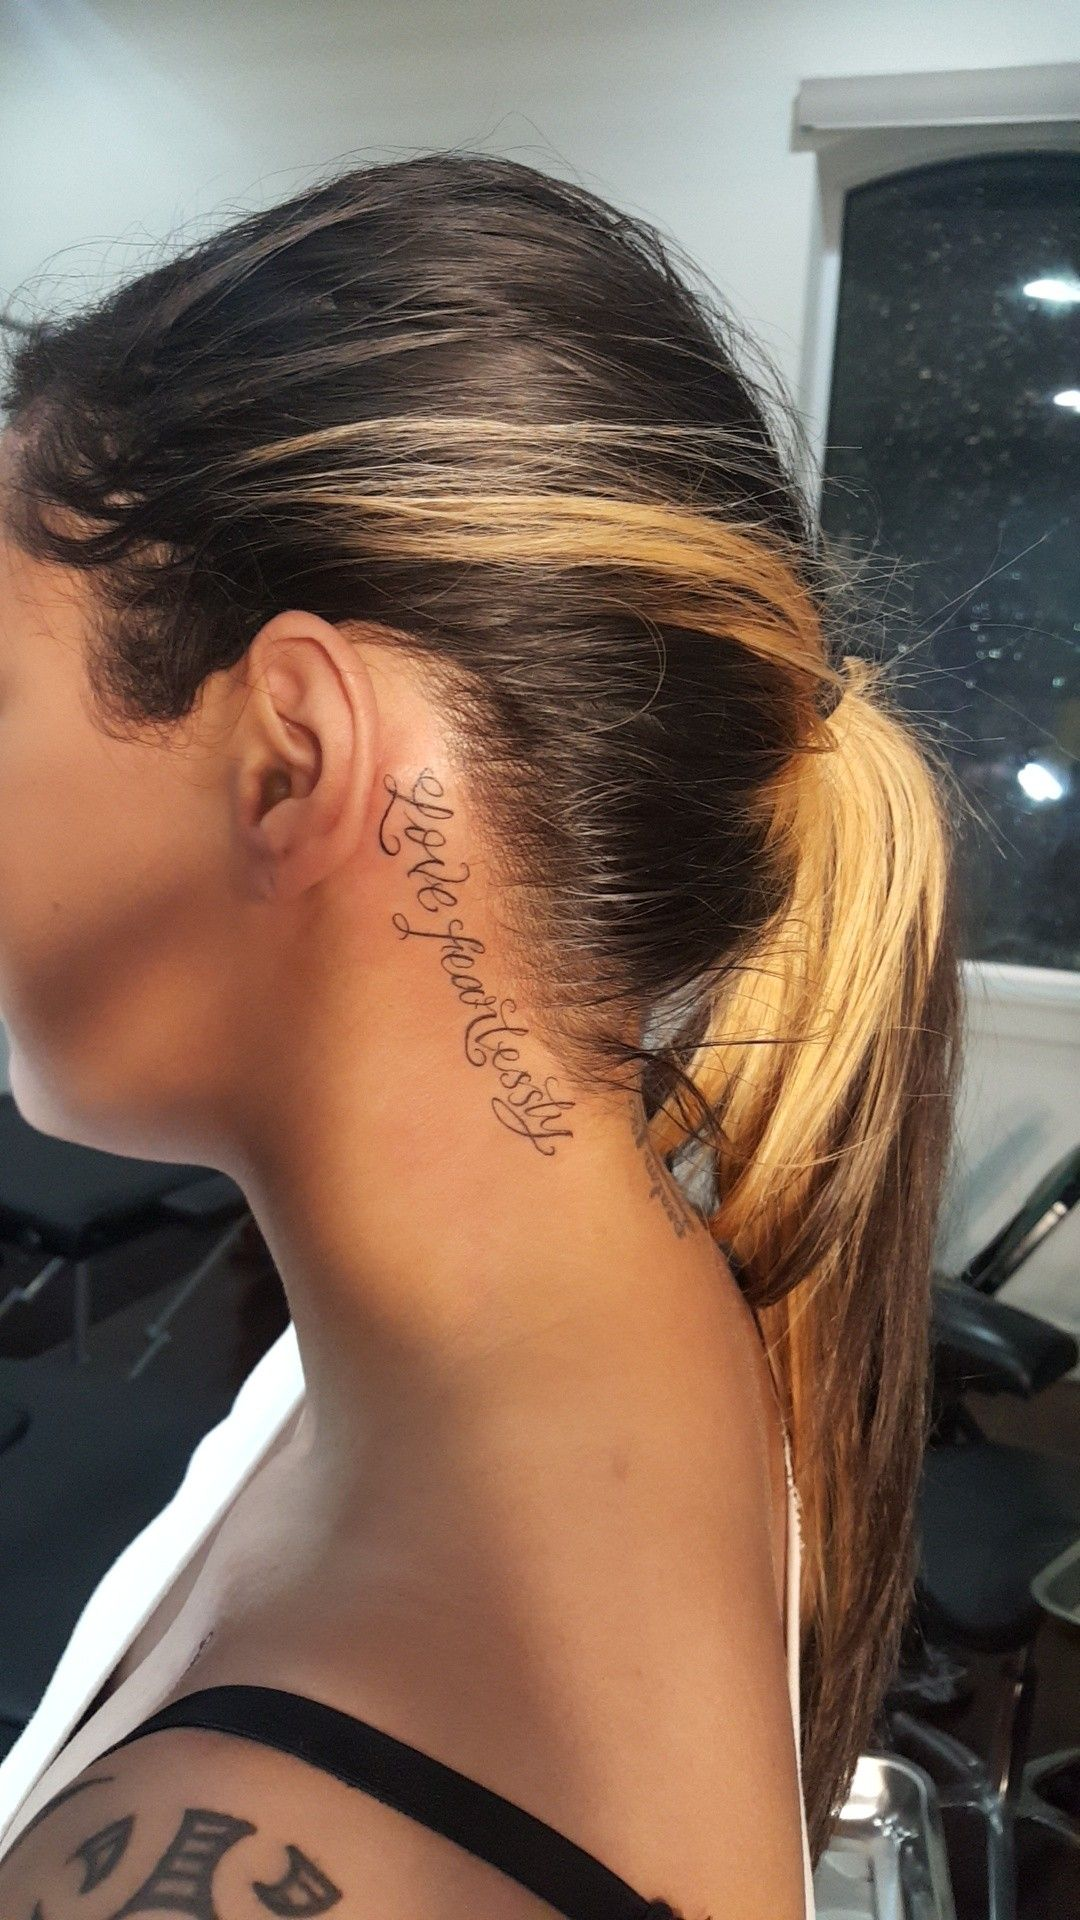 Number 14 Girl neck tattoos, Neck tattoos women